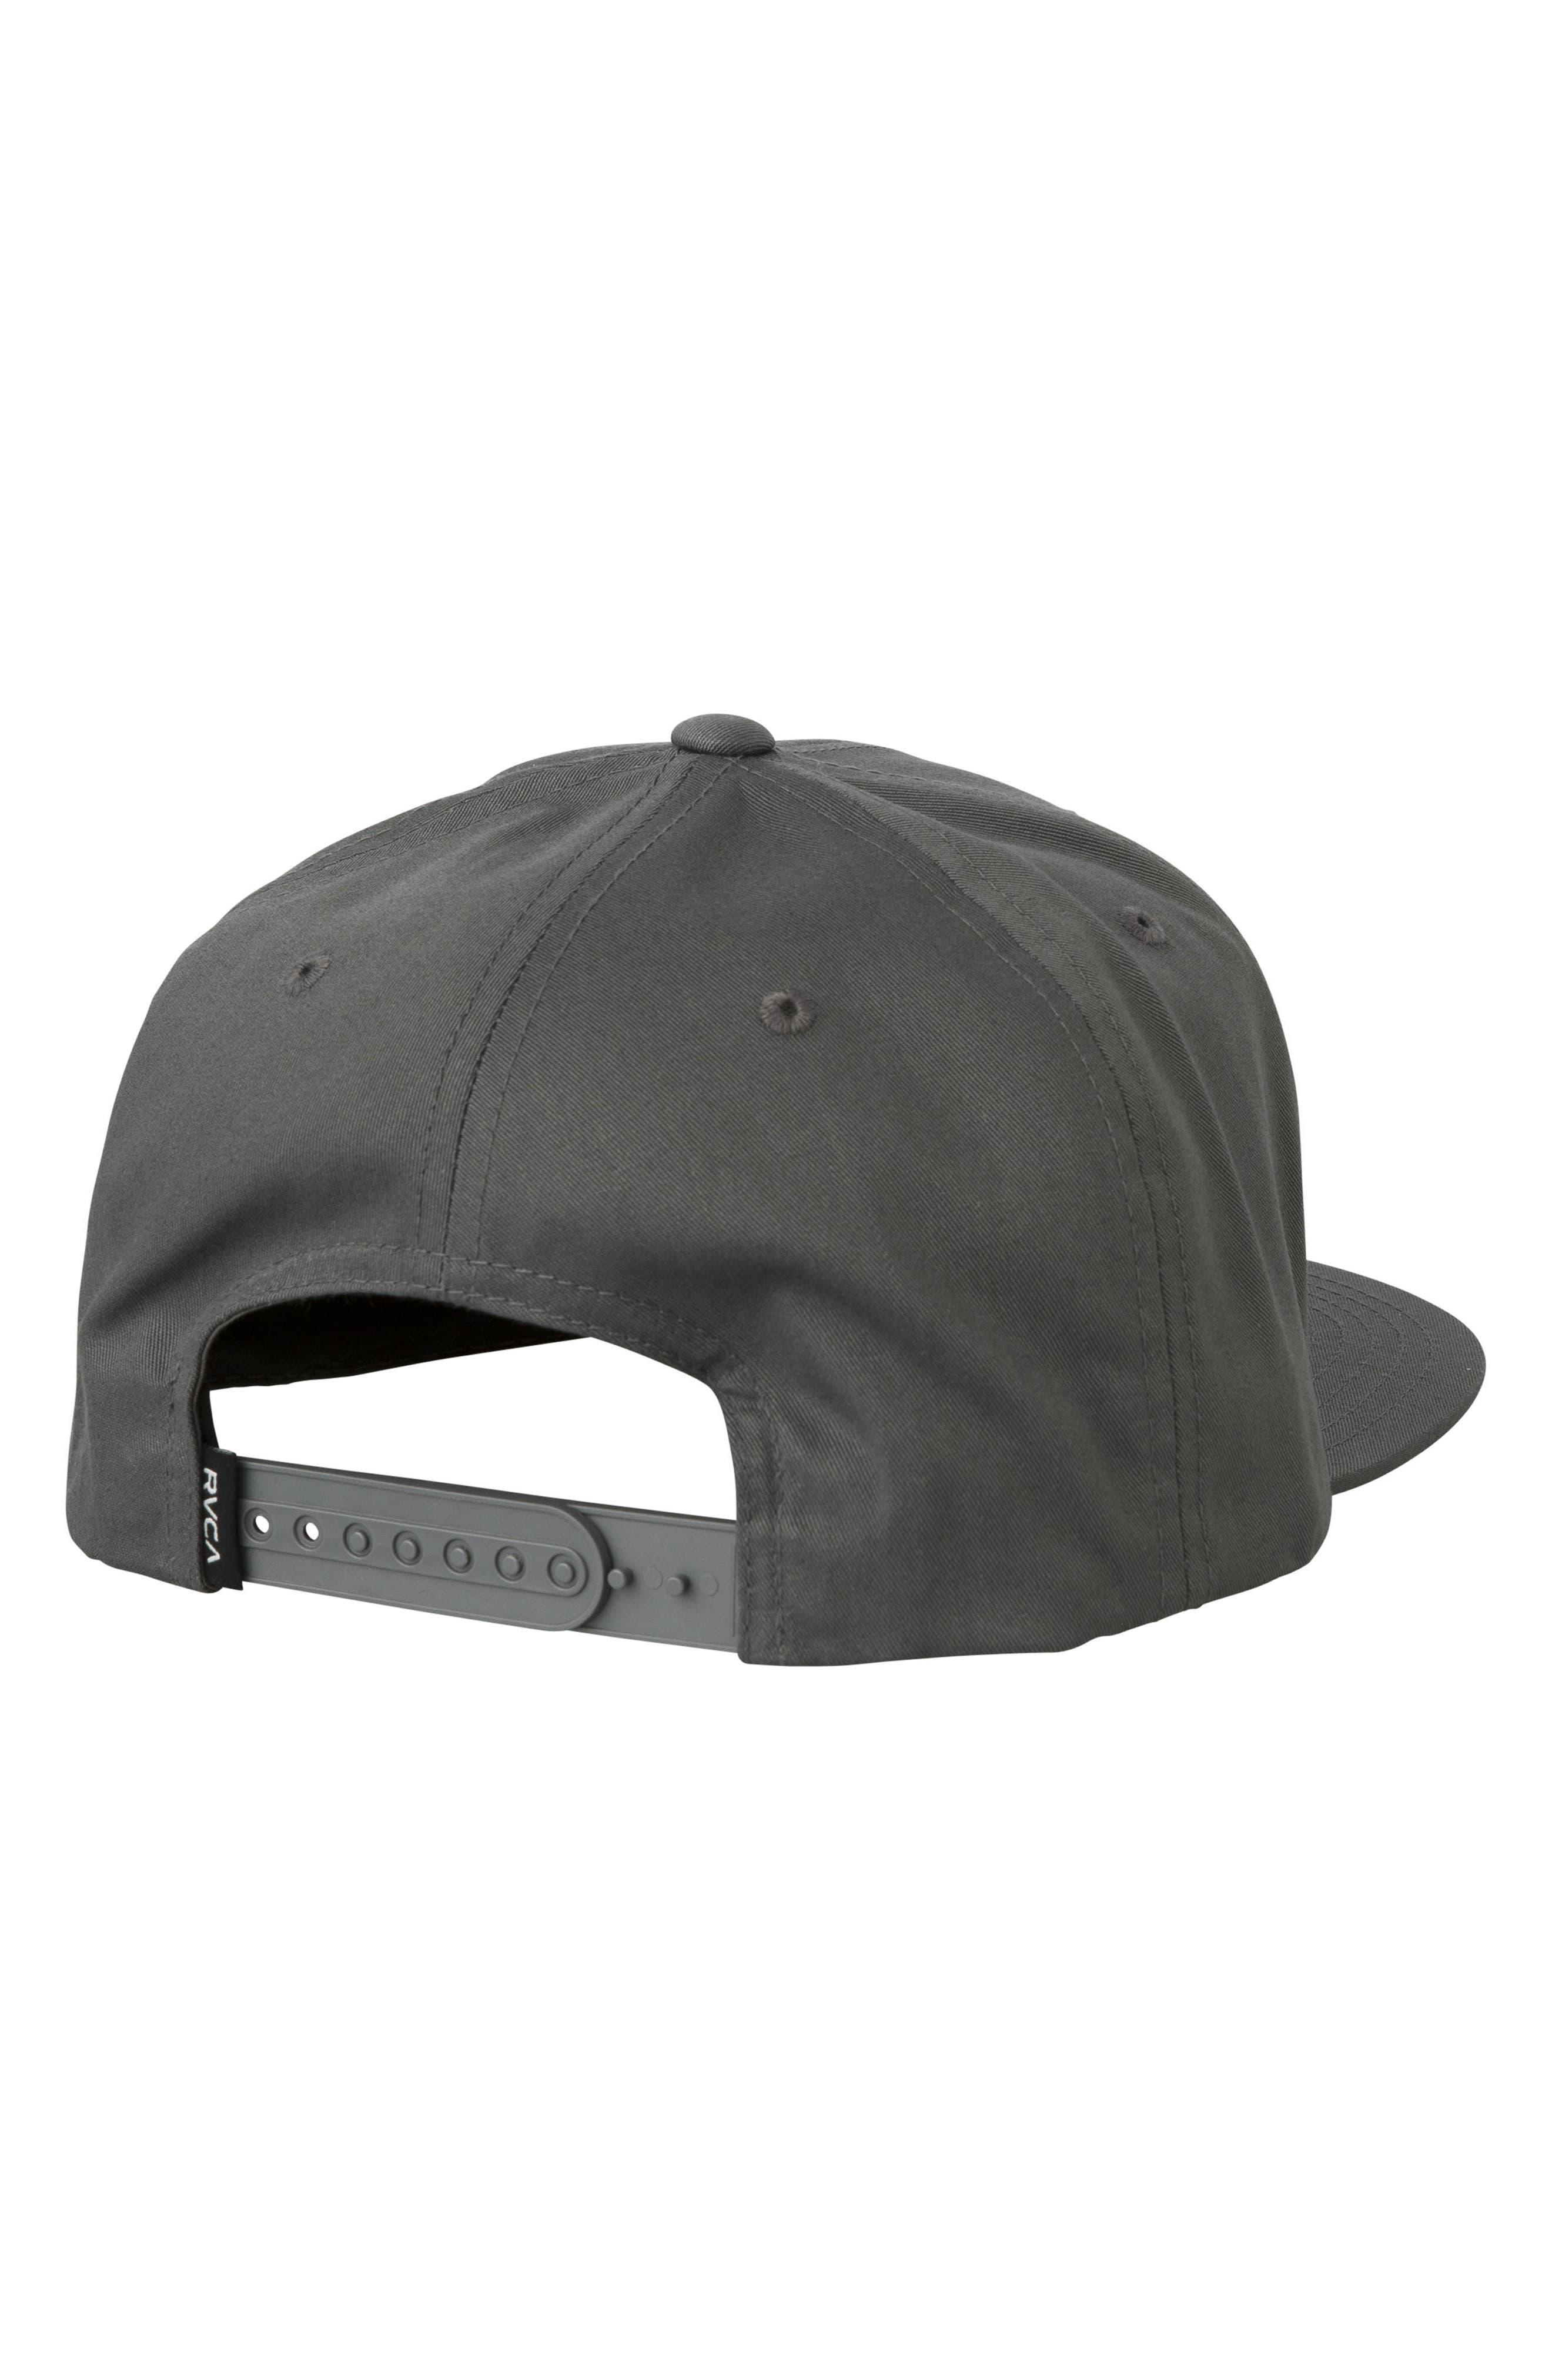 'VA' Snapback Hat,                             Alternate thumbnail 2, color,                             491